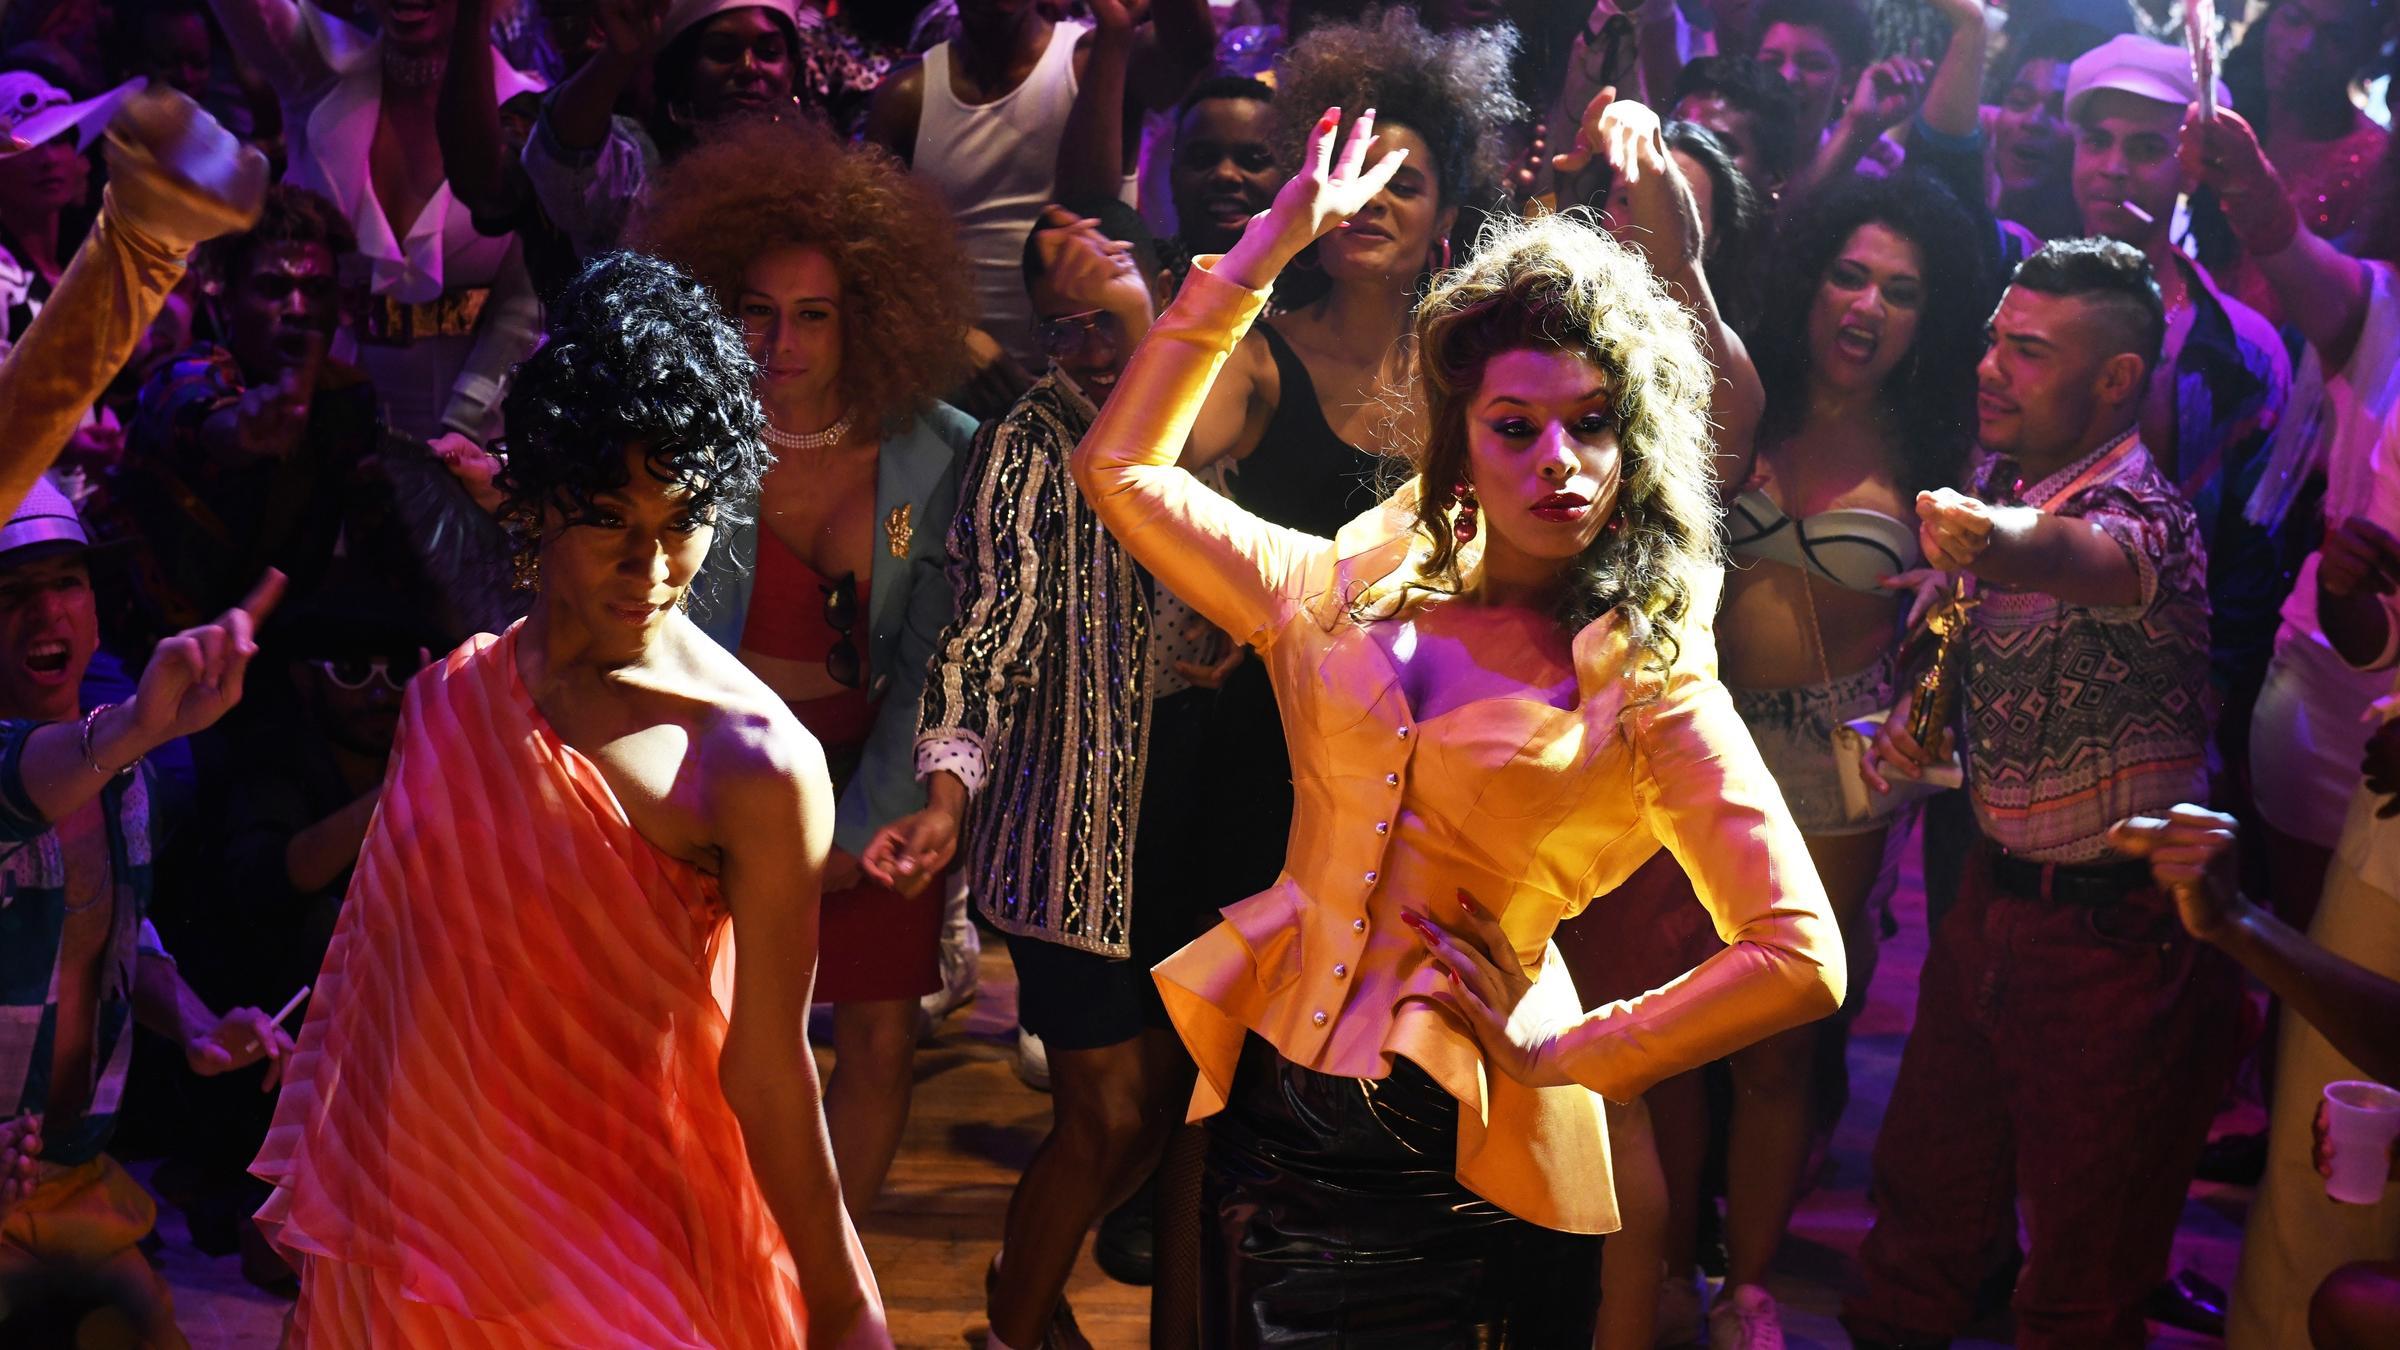 Barbara Blair,Pia Guanio (b. 1974) Sex image Jennifer Garner,Sandy Andolong (b. 1959)